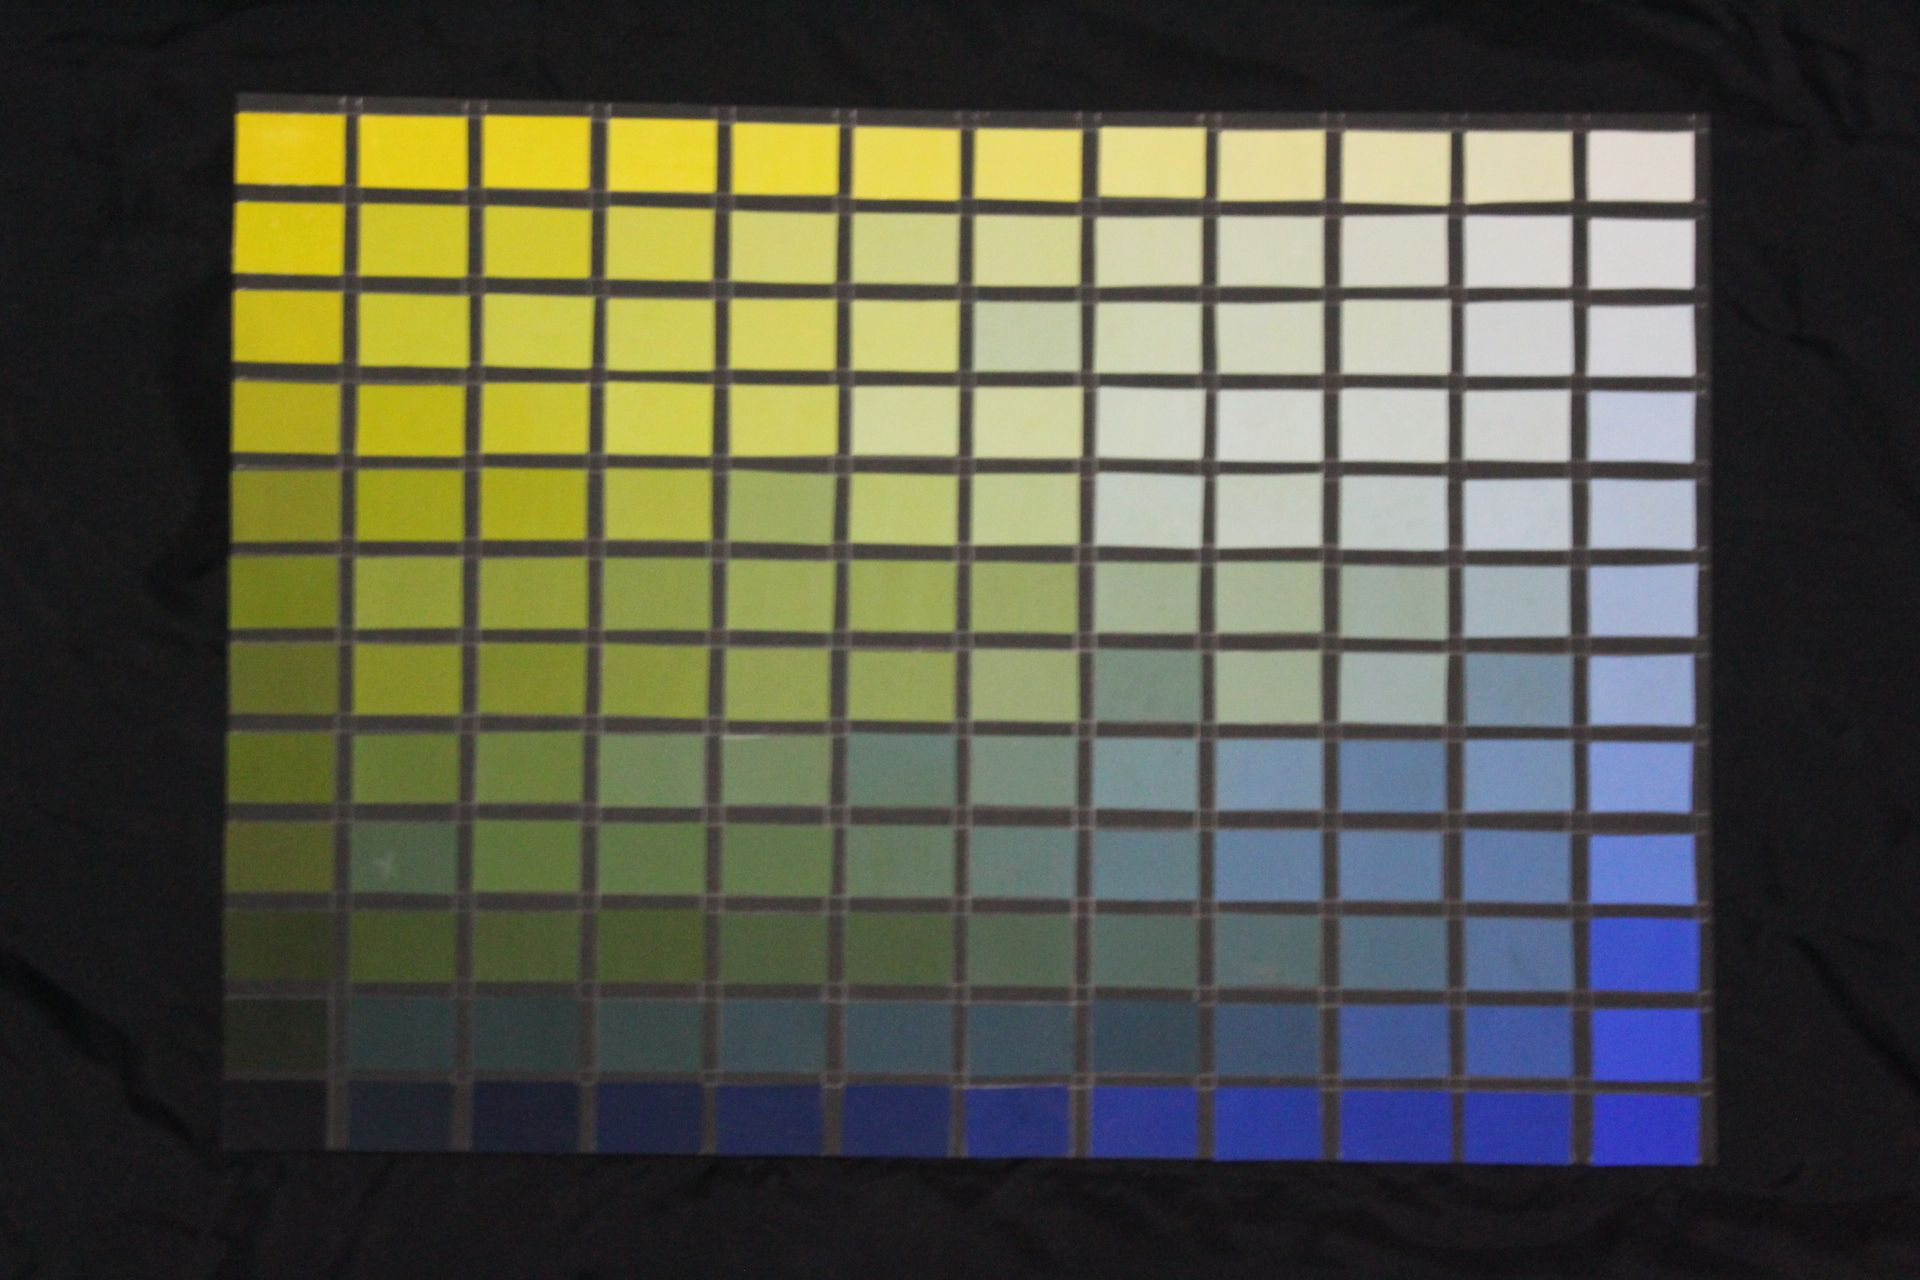 Gradasi Warna Biru Dan Kuning Cat Poster Arsitekturinterior Interiorarchitecture Color Warna Interior Arsitektur